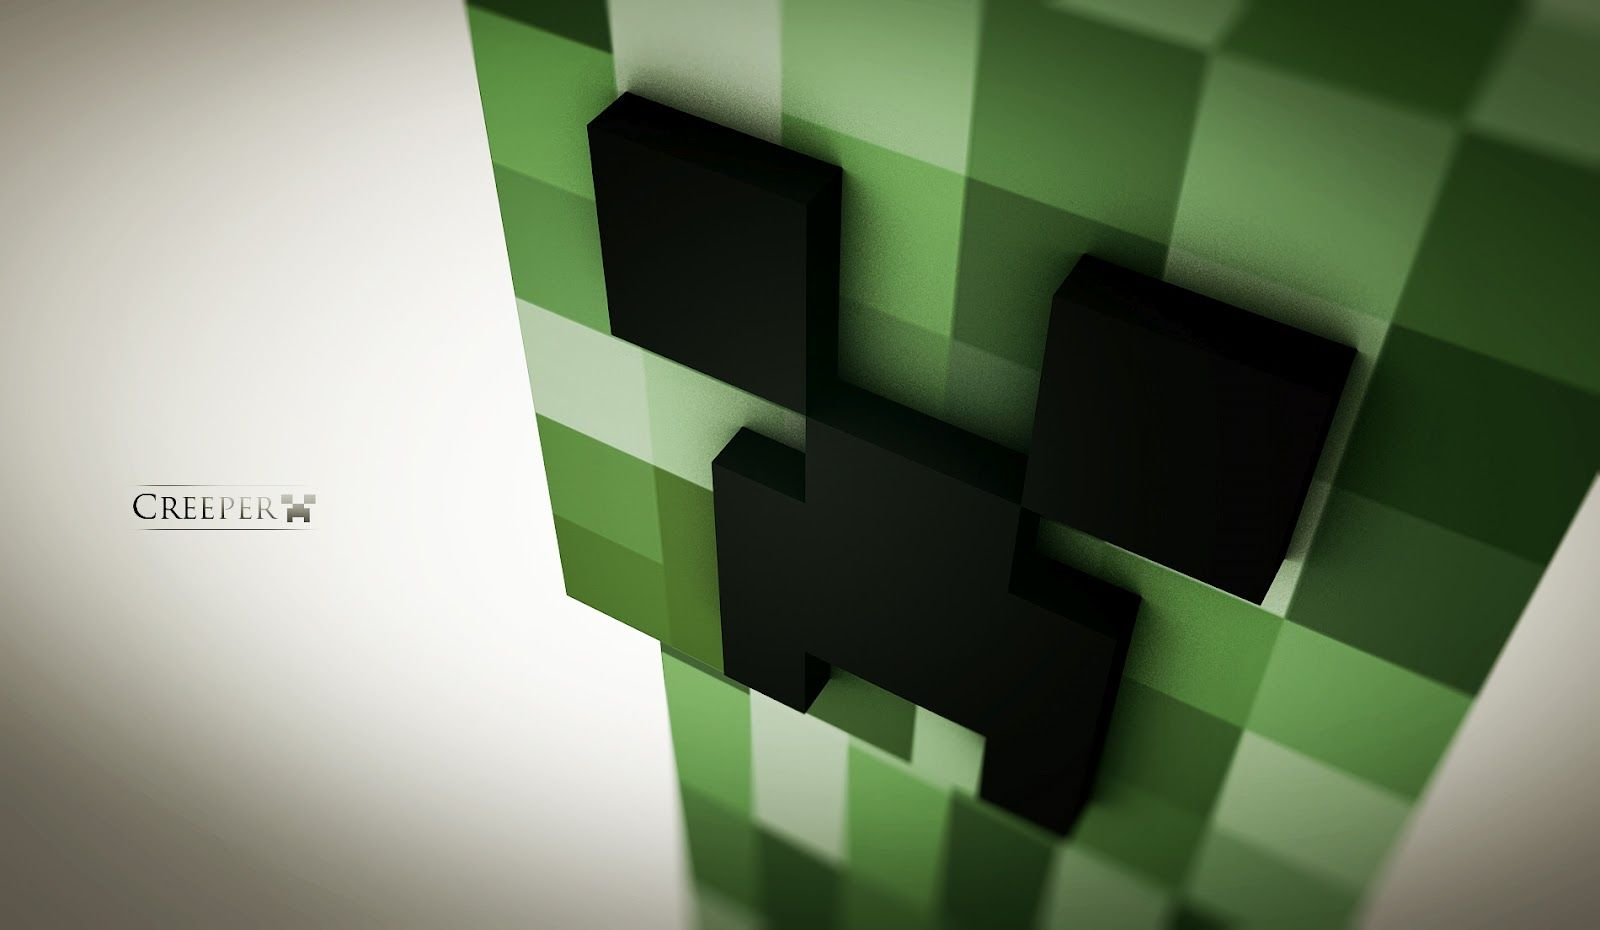 Creeper Wallpaper By Reneartlol D555f8t Jpg 1600 930 Minecraft Wallpaper Creeper Minecraft Creepers